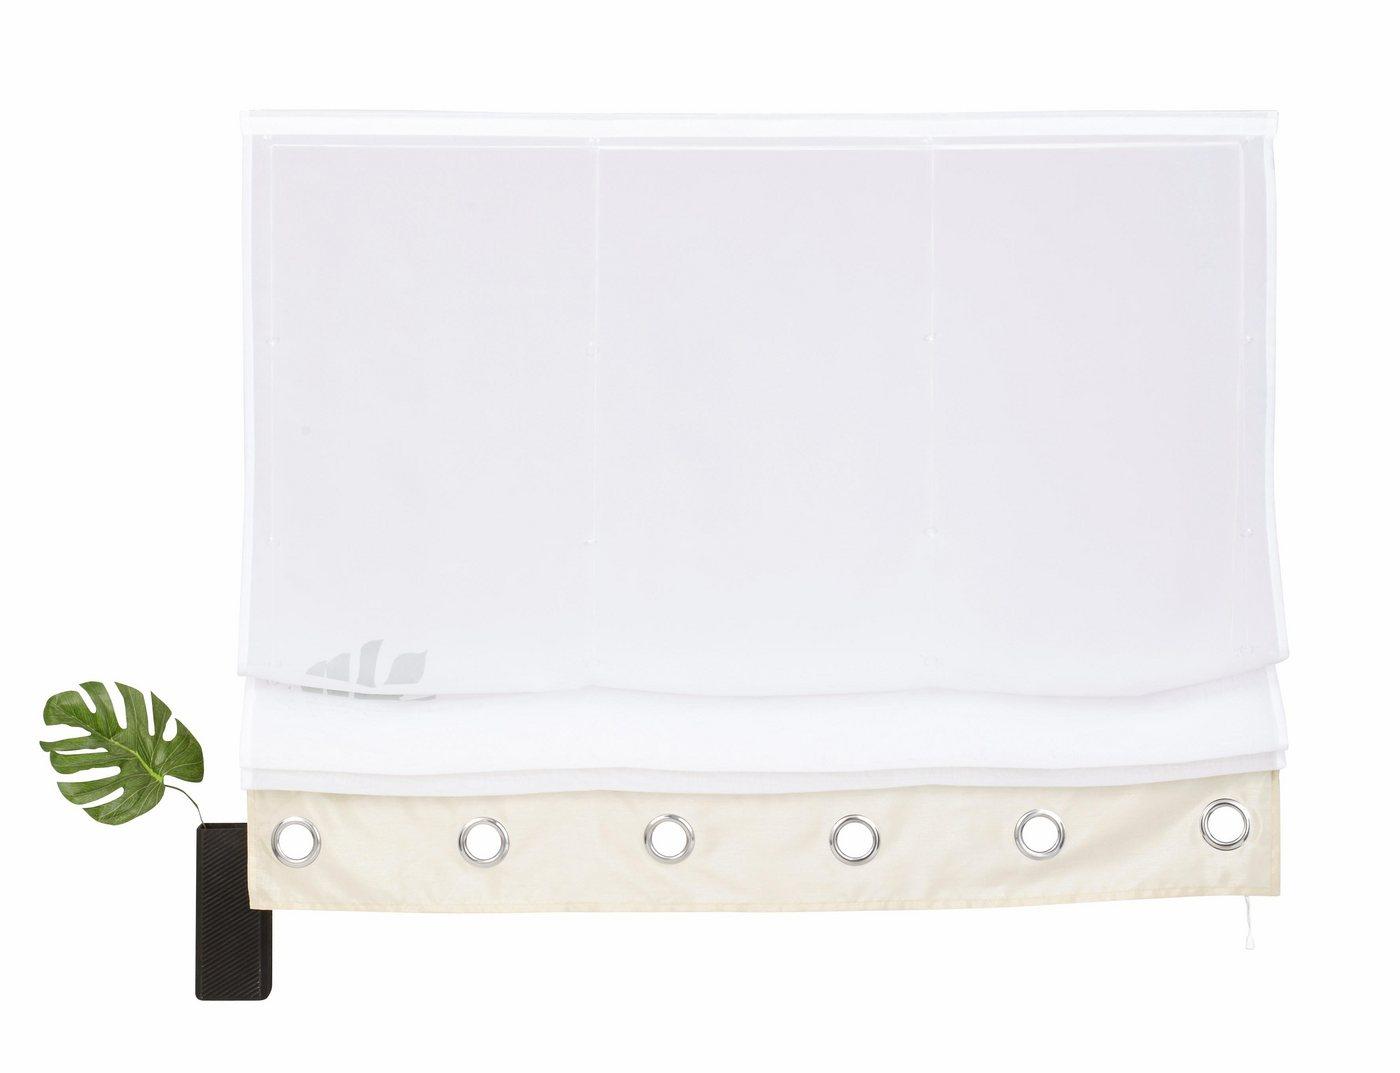 raffrollo befestigung preisvergleiche. Black Bedroom Furniture Sets. Home Design Ideas